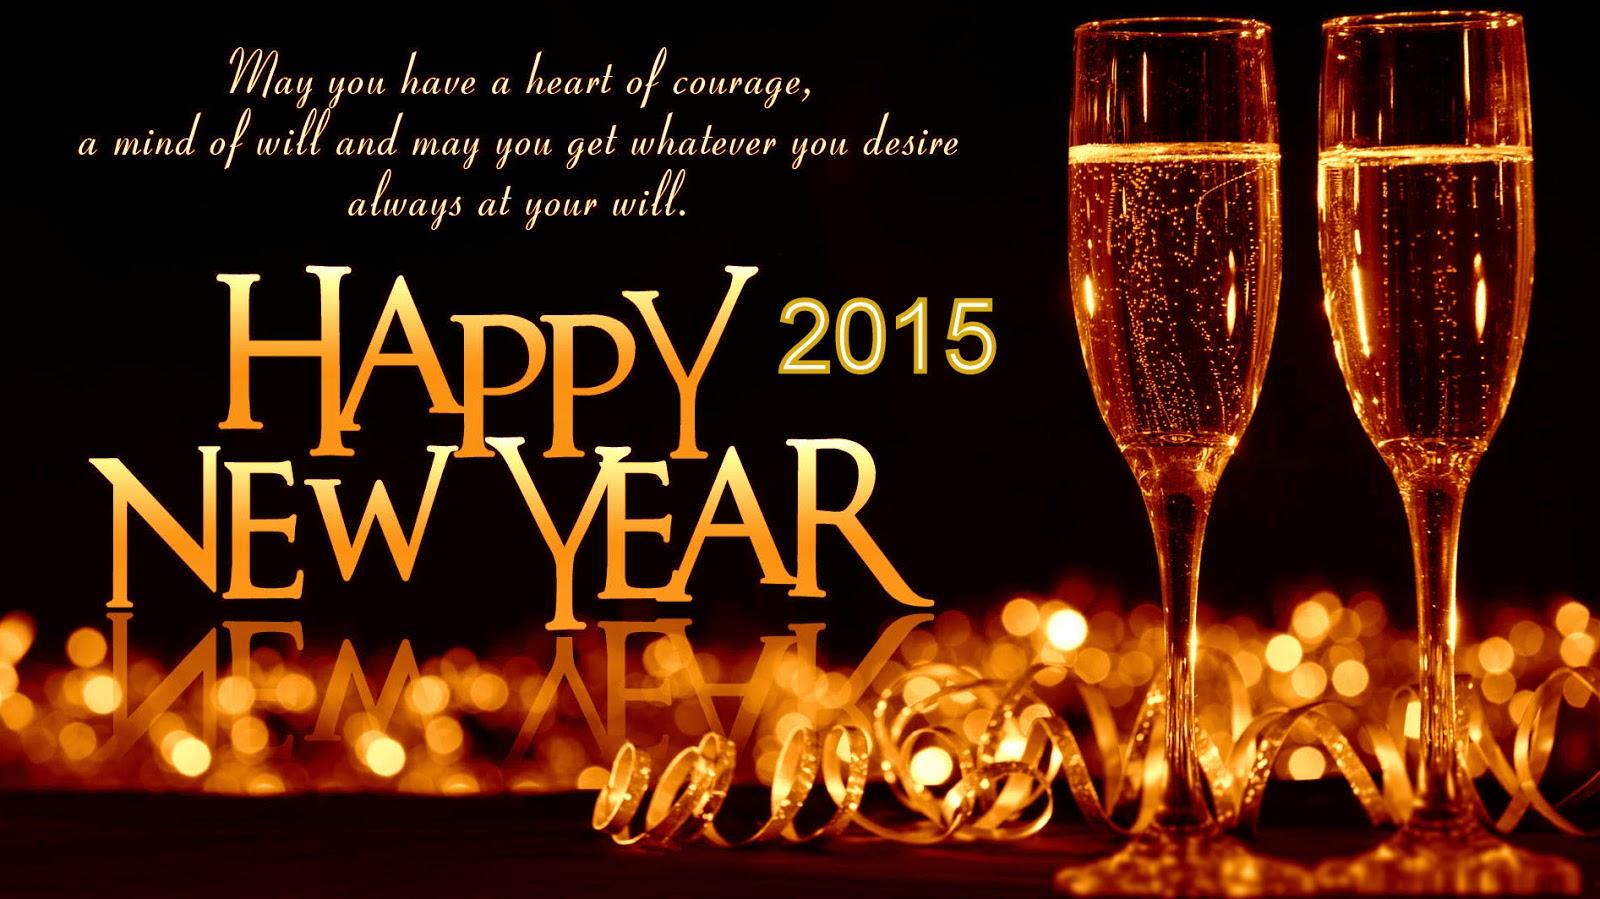 Happy new year 2016 celebration home decoration invitation ideas happy new year 2016 celebration home decoration invitation ideas kristyandbryce Images